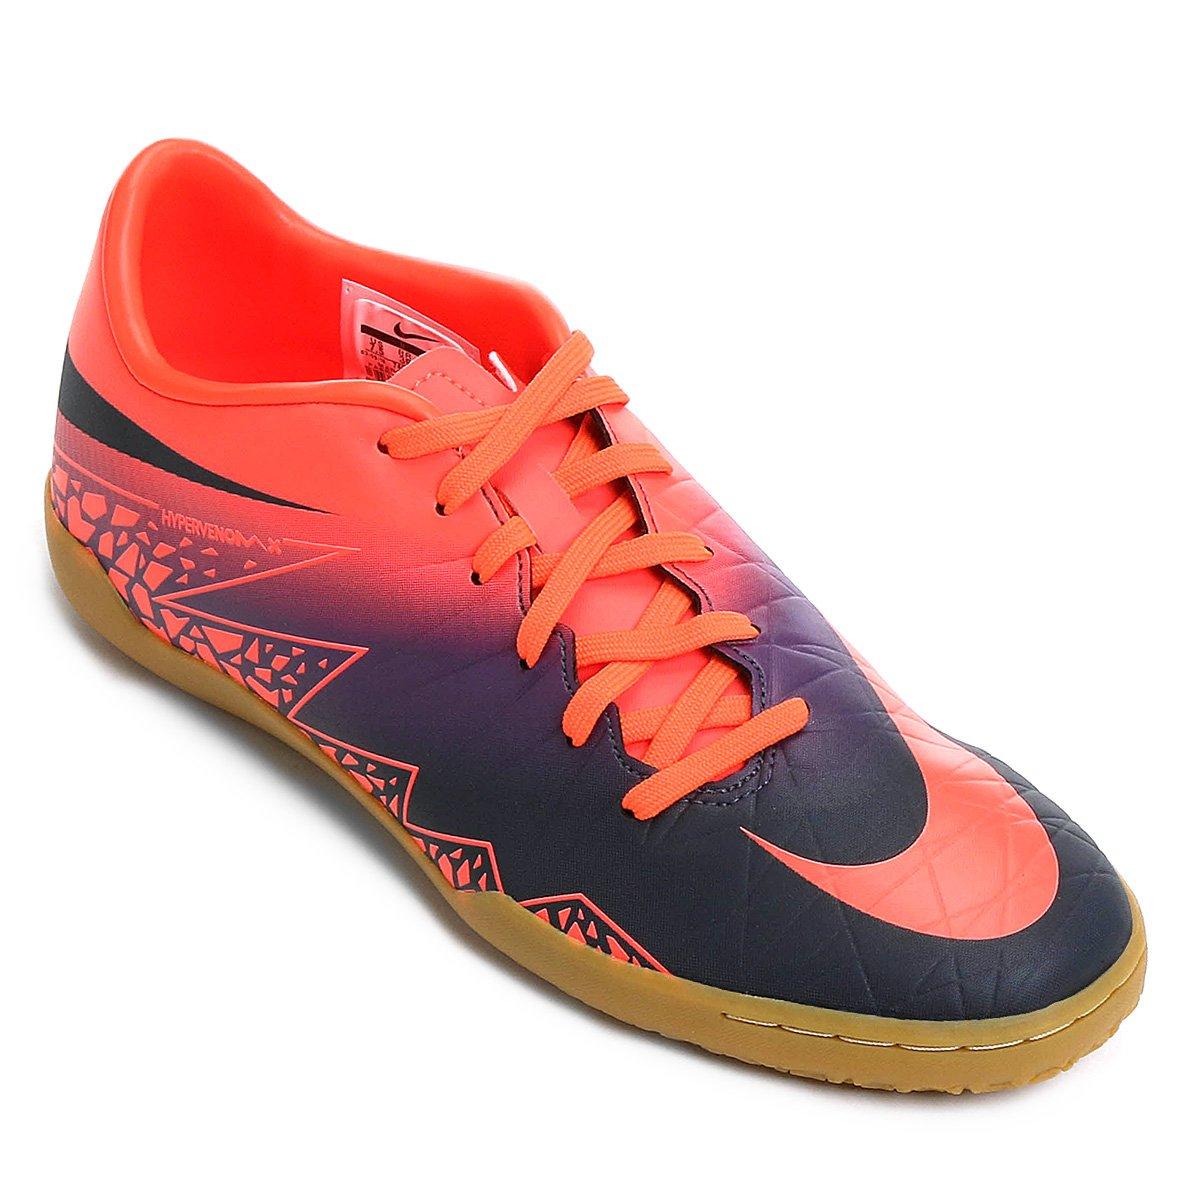 5bf05e1df0cc3 ... Tênis Chuteira Nike Hypervenom Phelon 2 IC Futsal - Roxo e Laranja  Comprar Chuteira Society ...